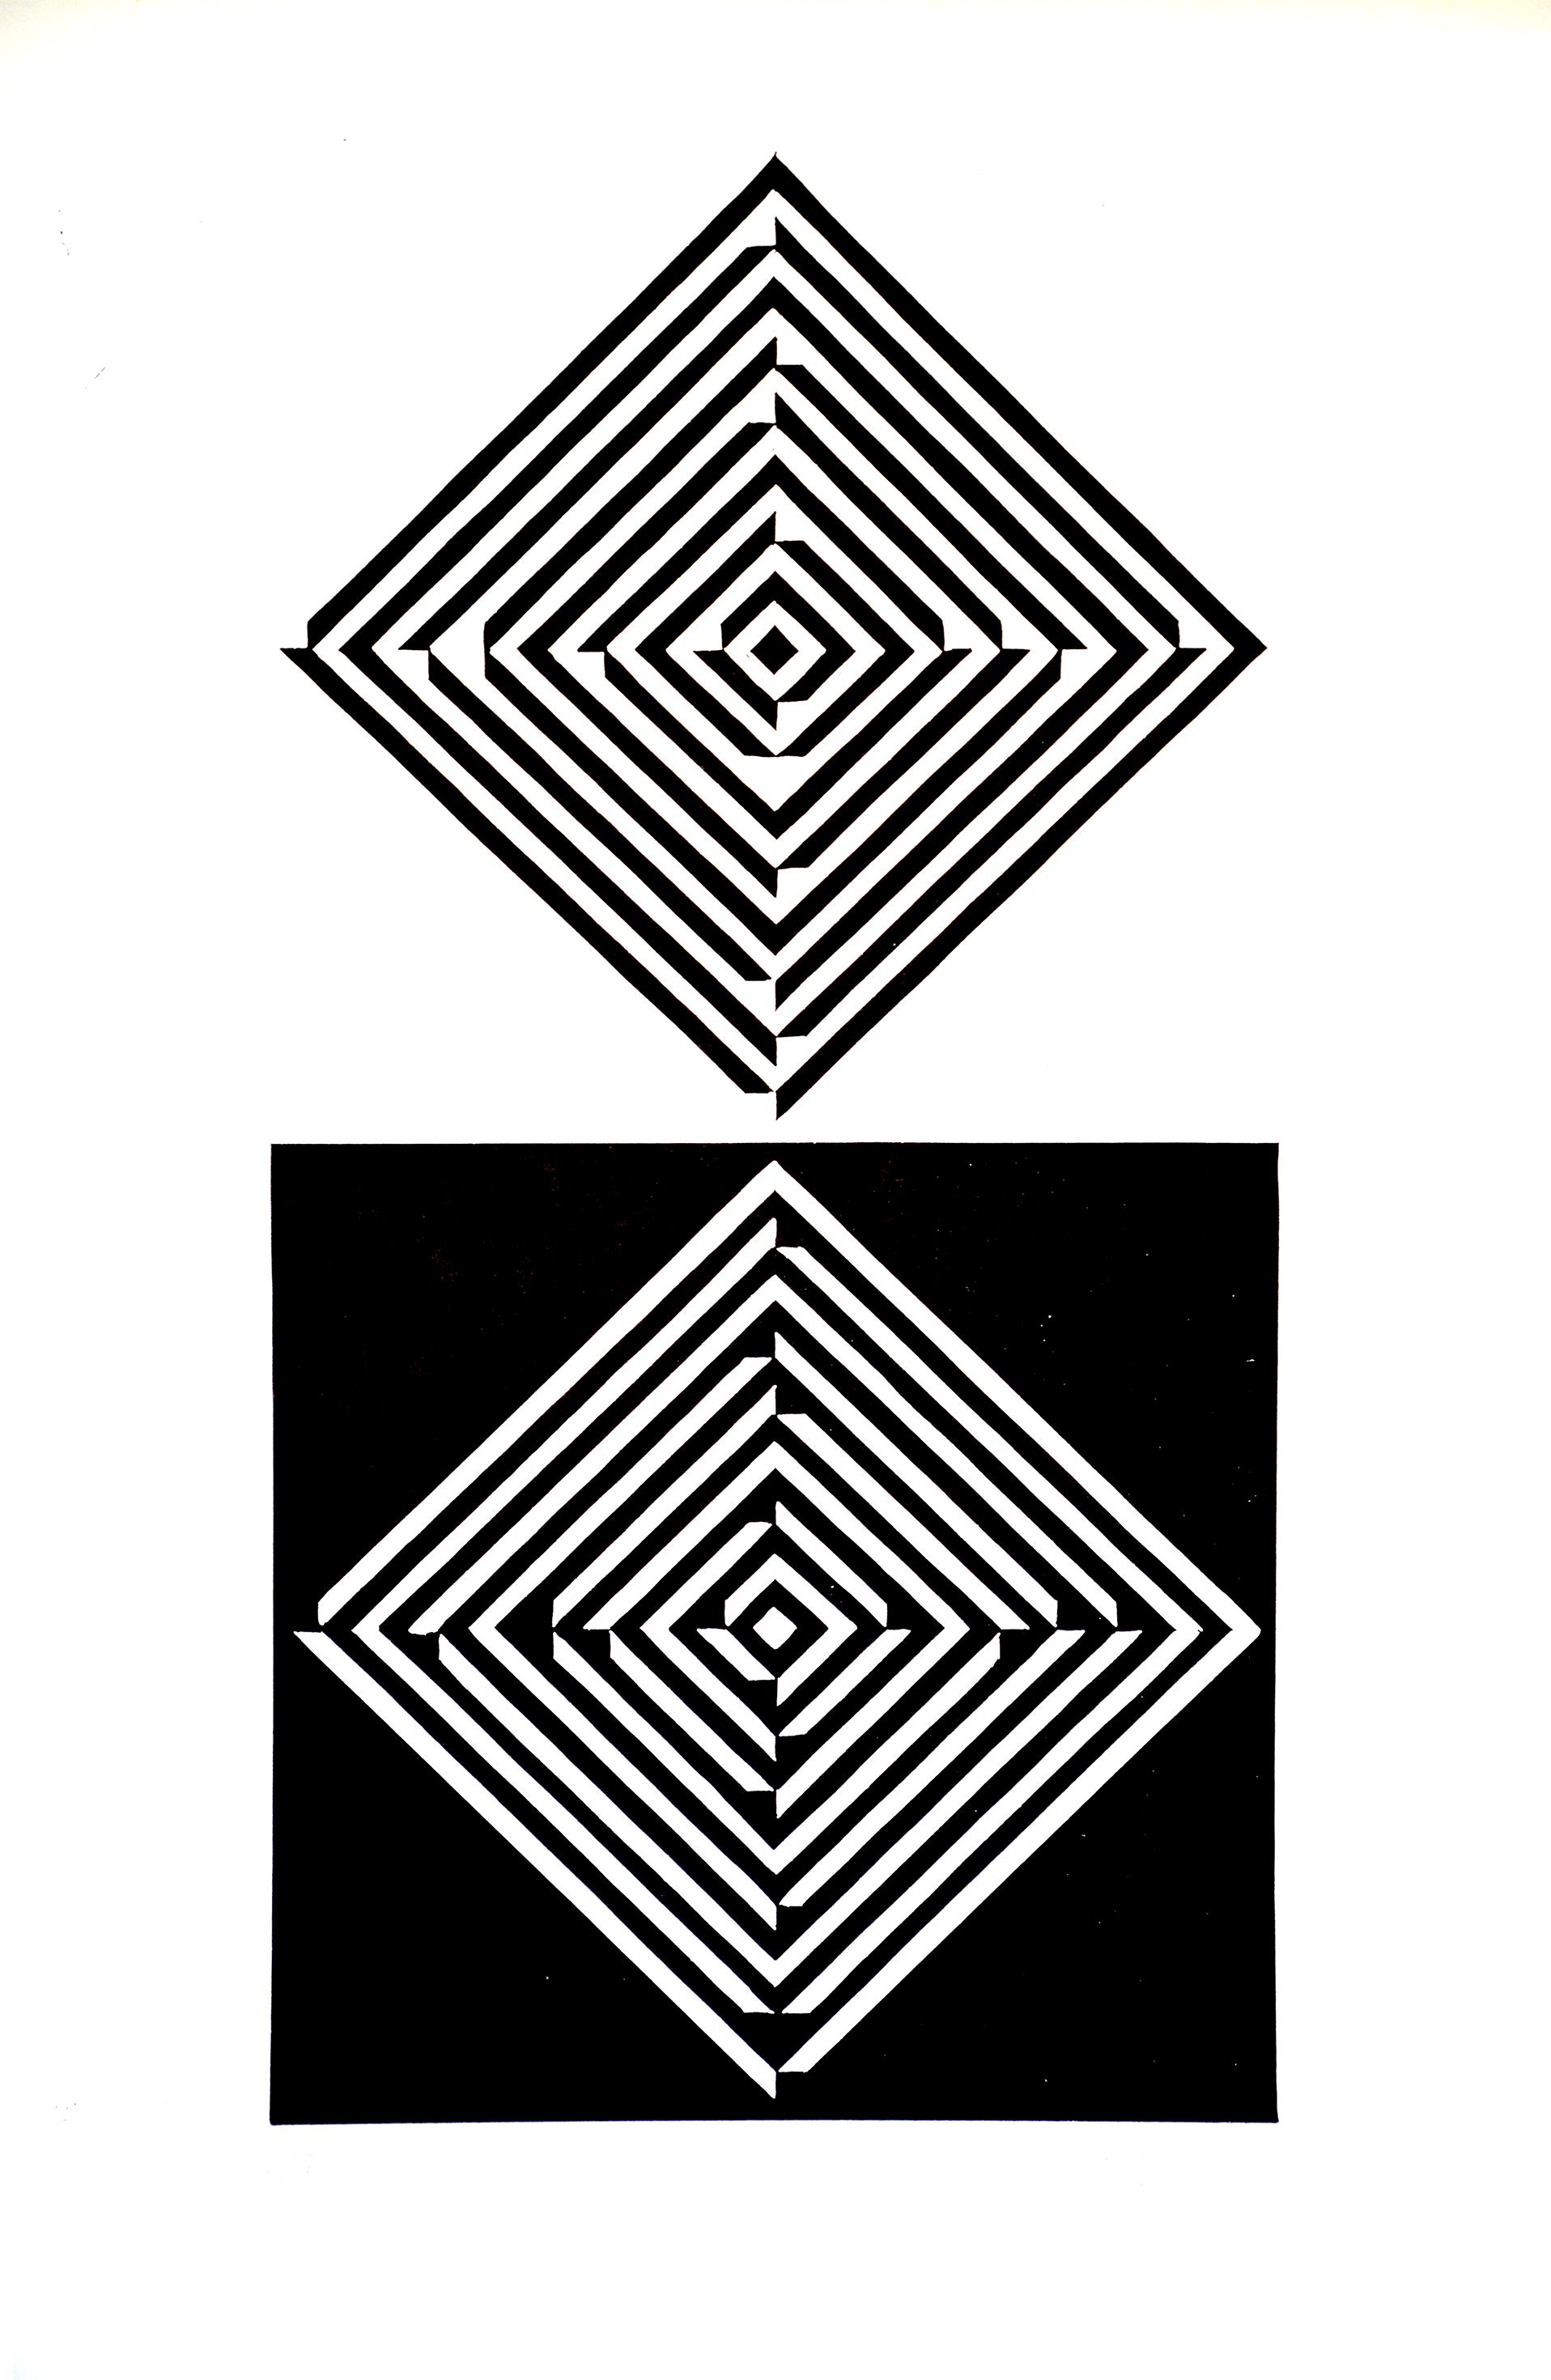 kirchberg-positiv-linoldruck-45x62